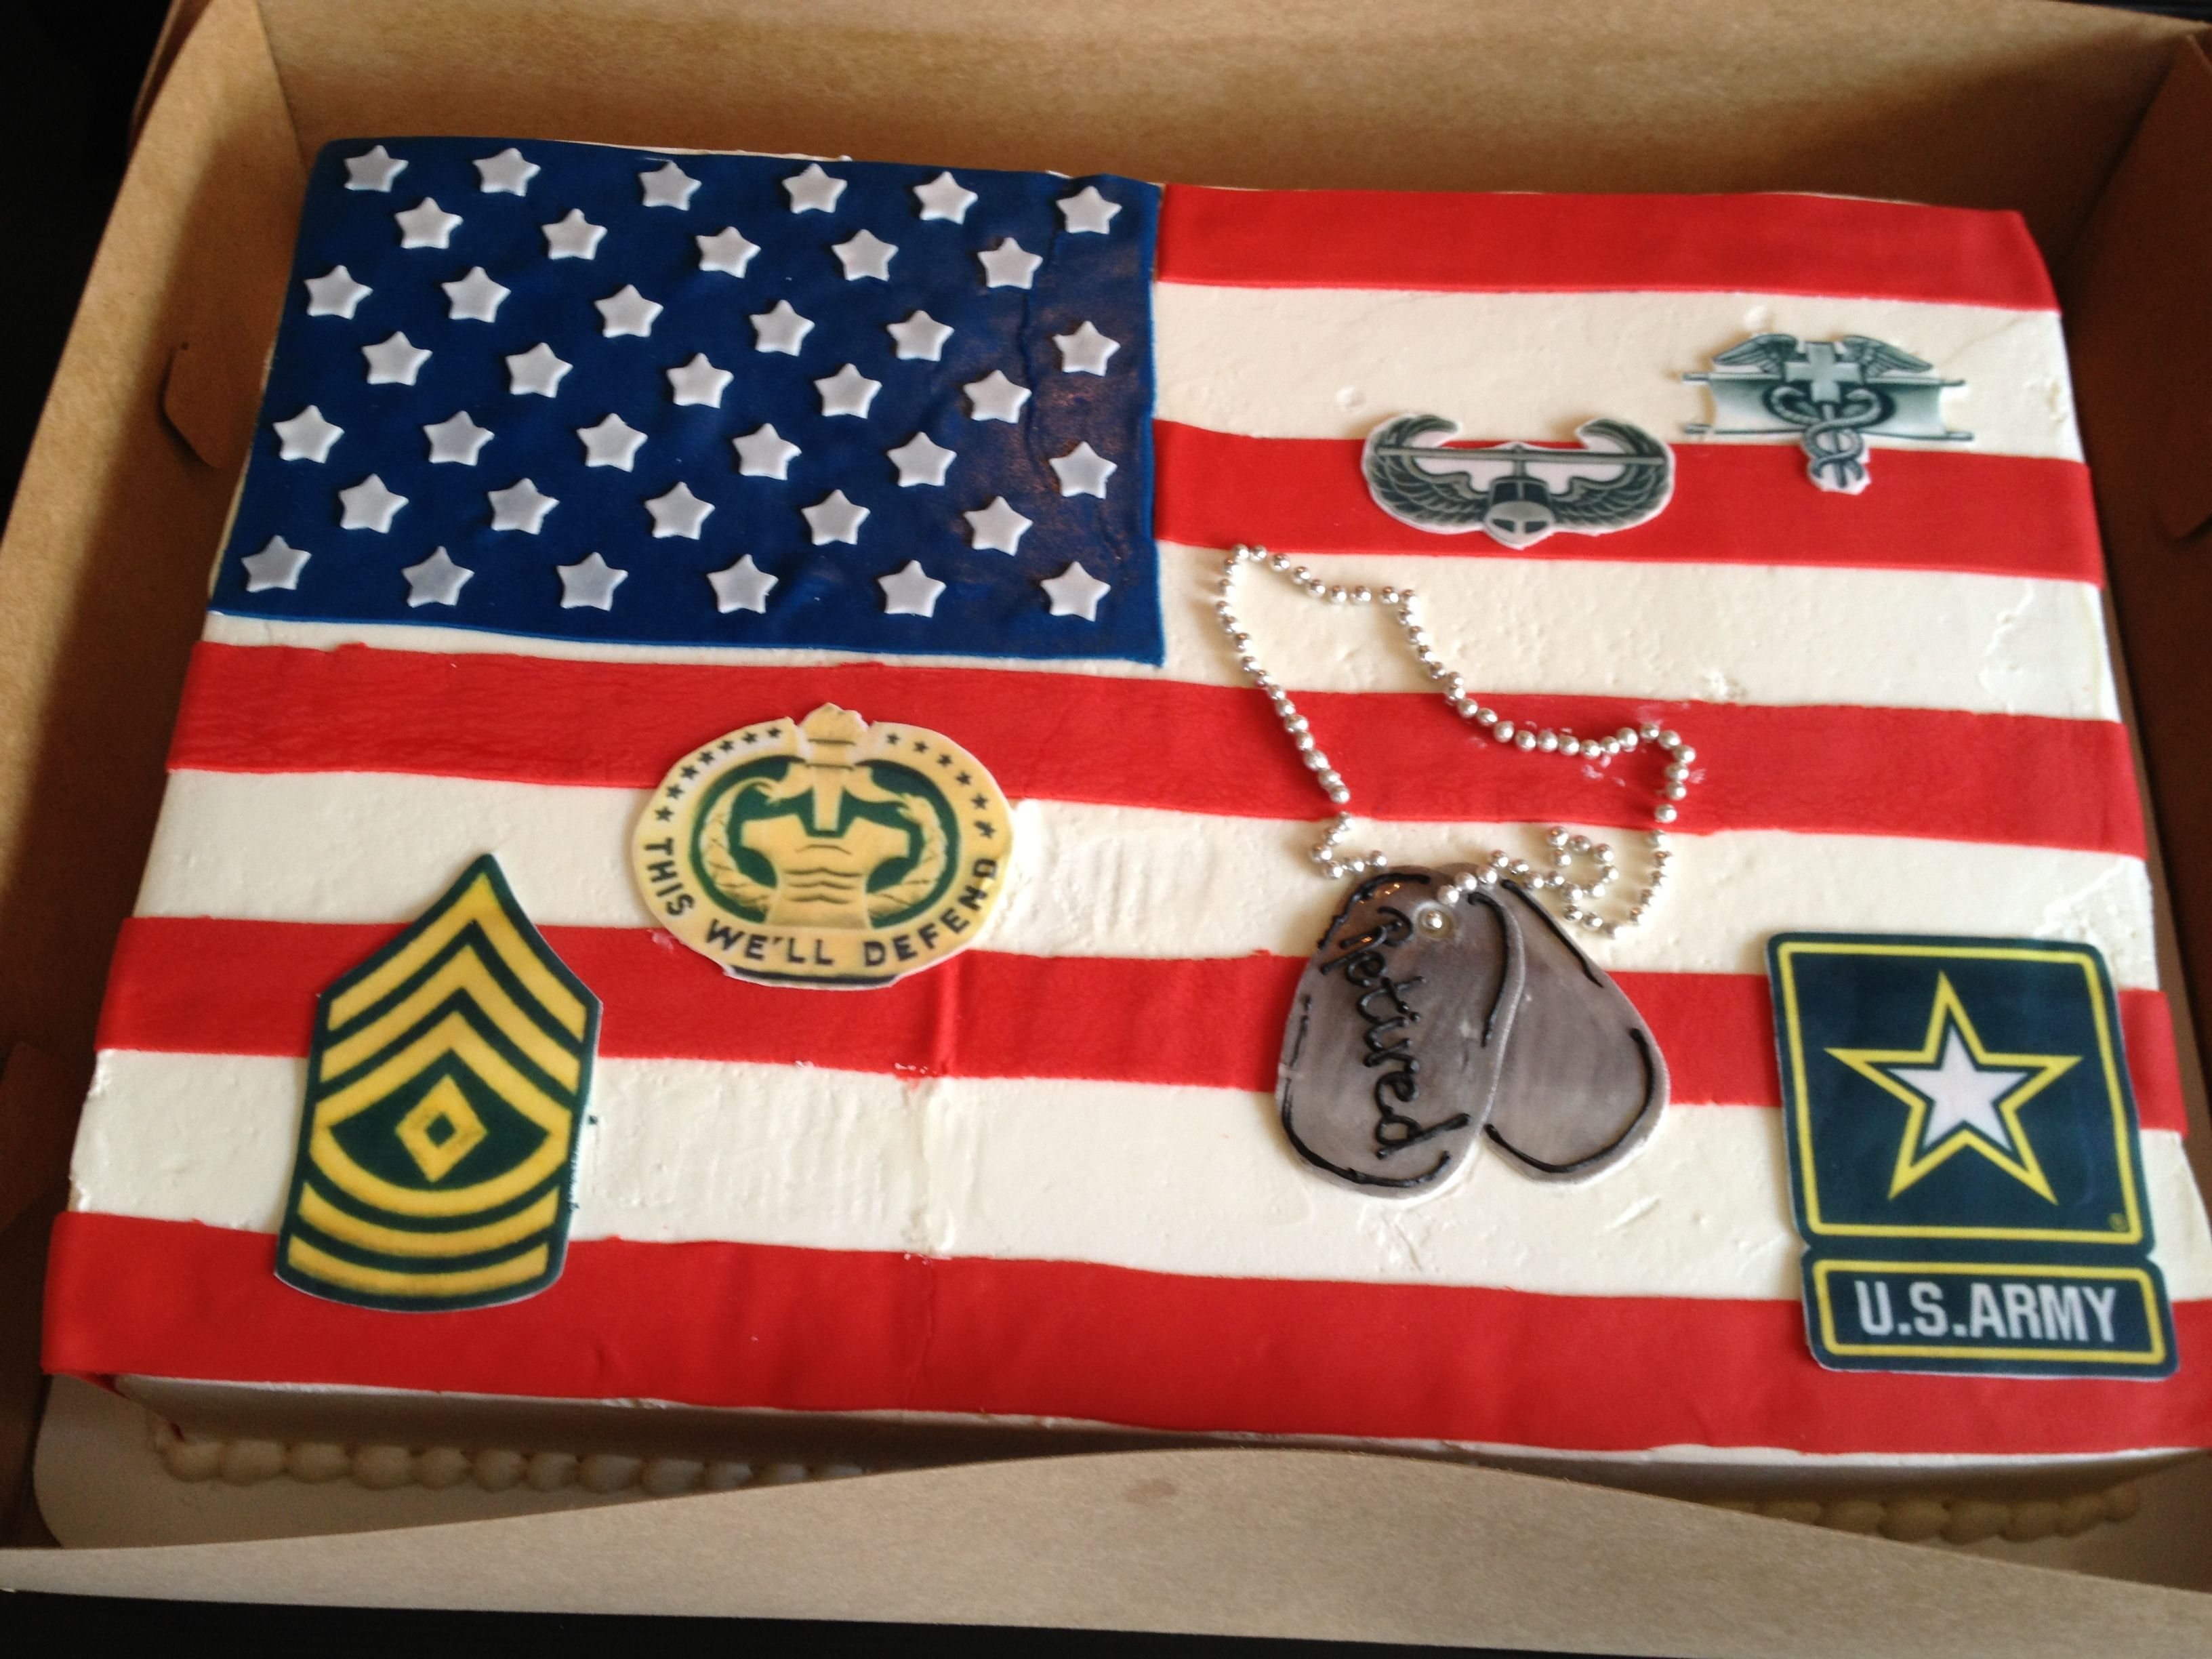 Army Retirement Cake Military Retirement Cake Army Retirement